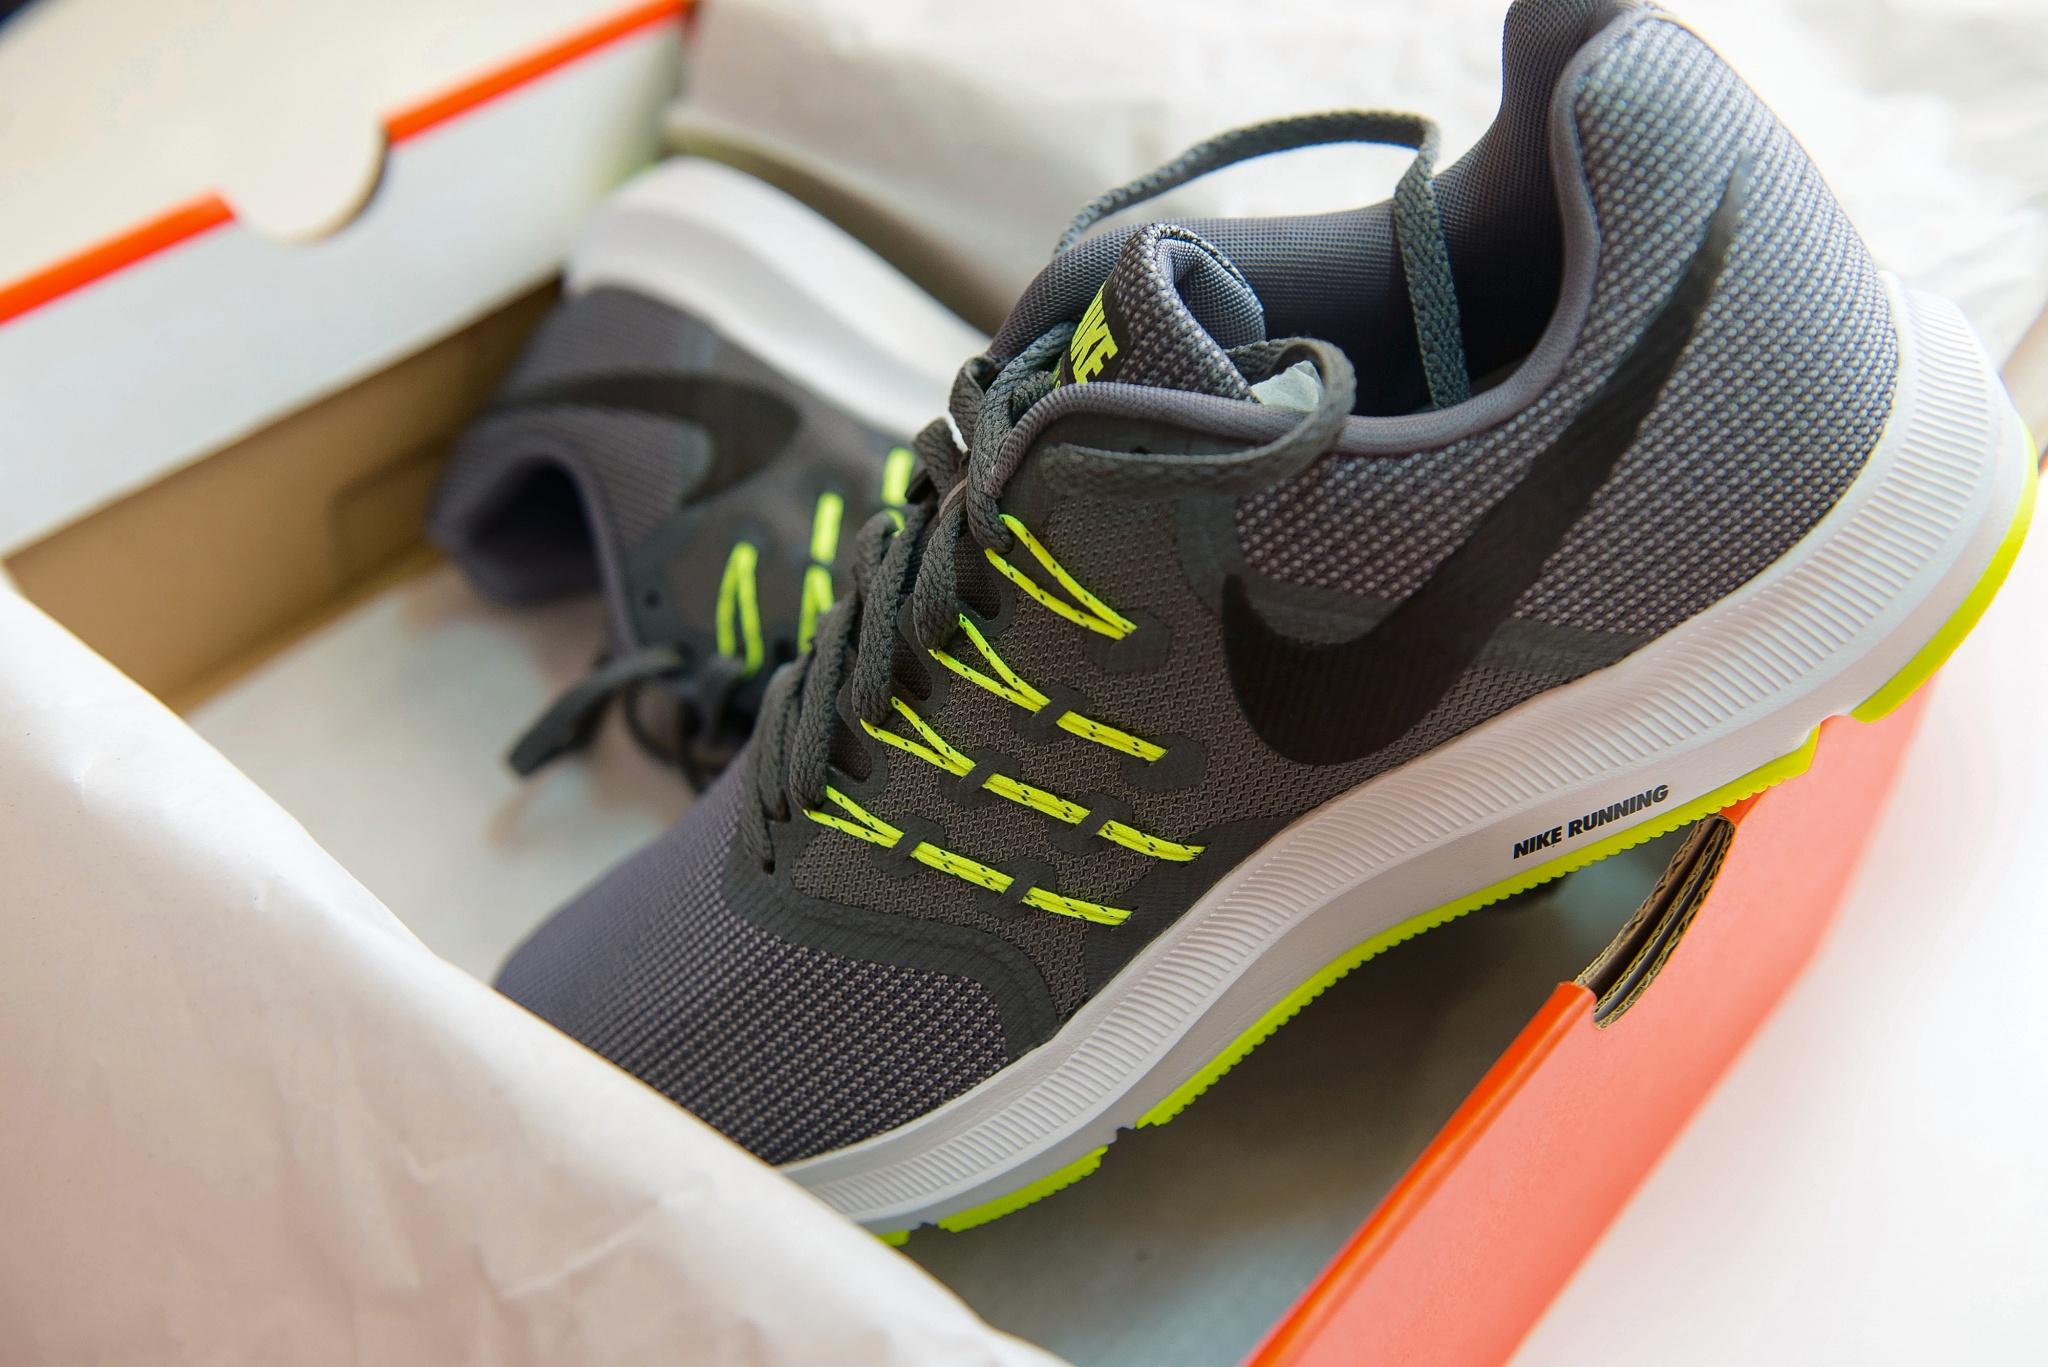 NIKE 908989-007 Run Swift Running Shoe